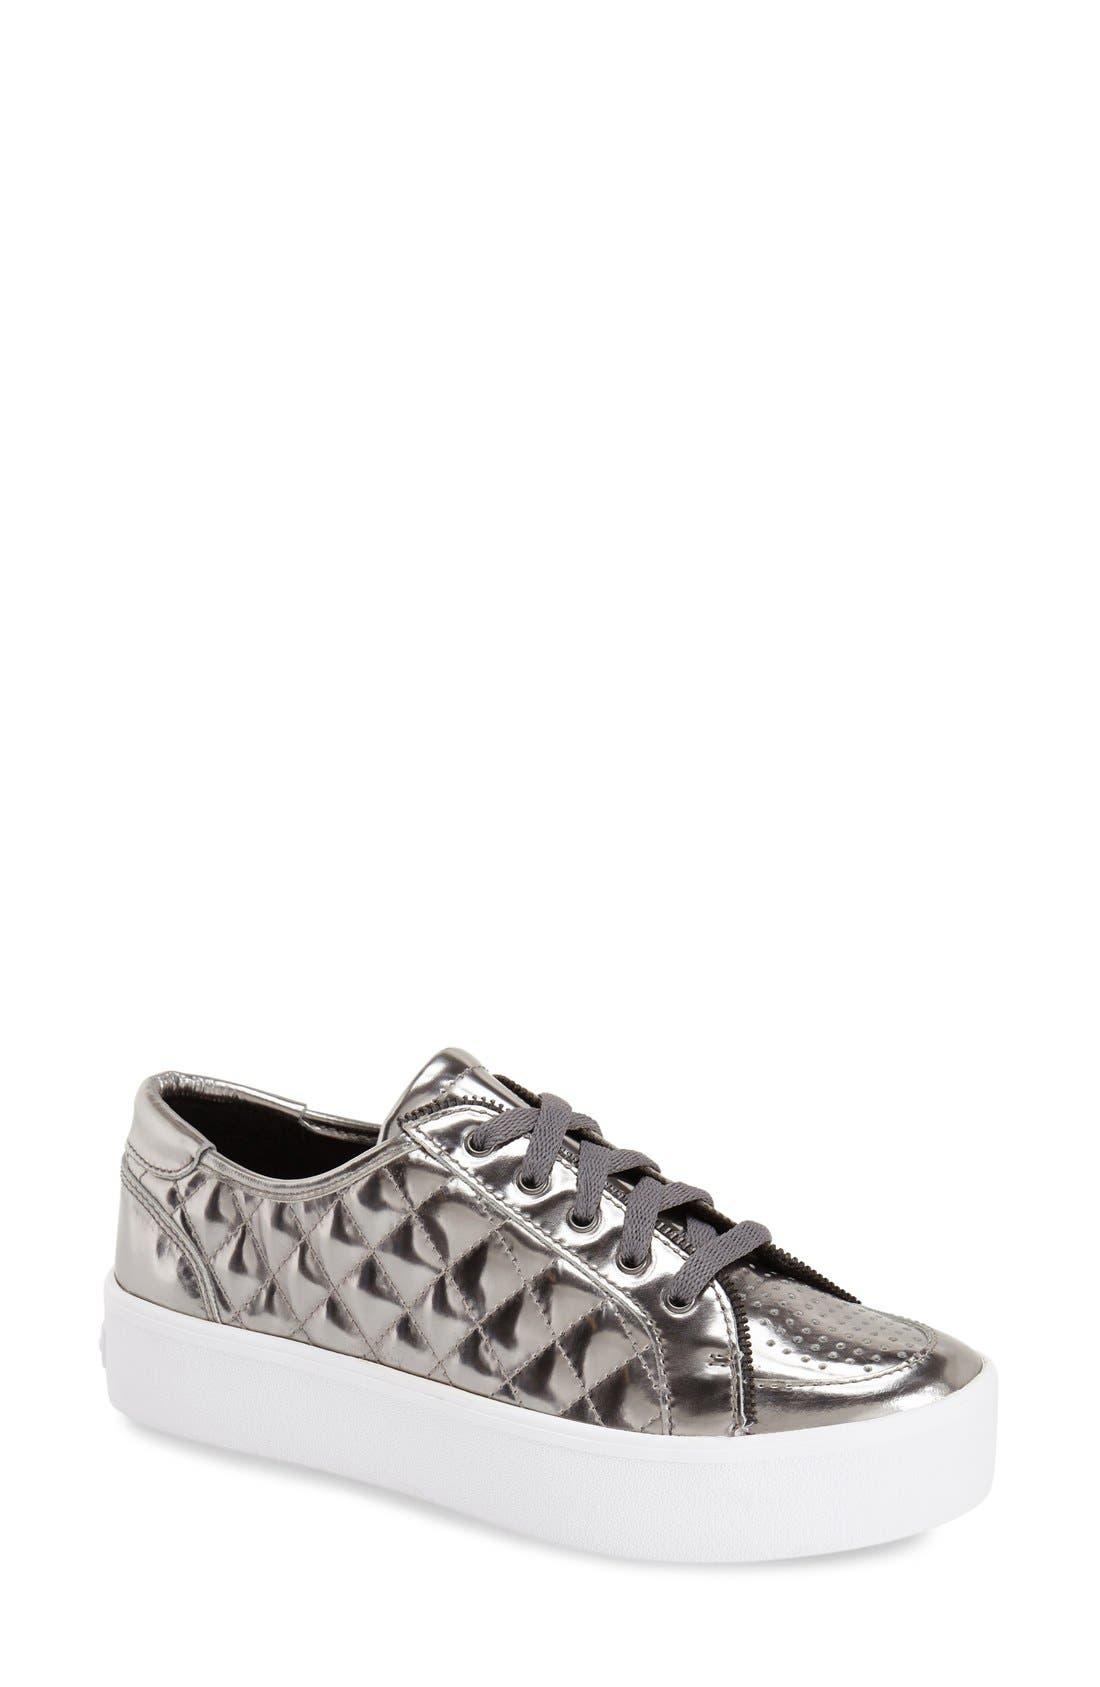 Main Image - Rebecca Minkoff 'Sandra' Platform Sneaker (Women)